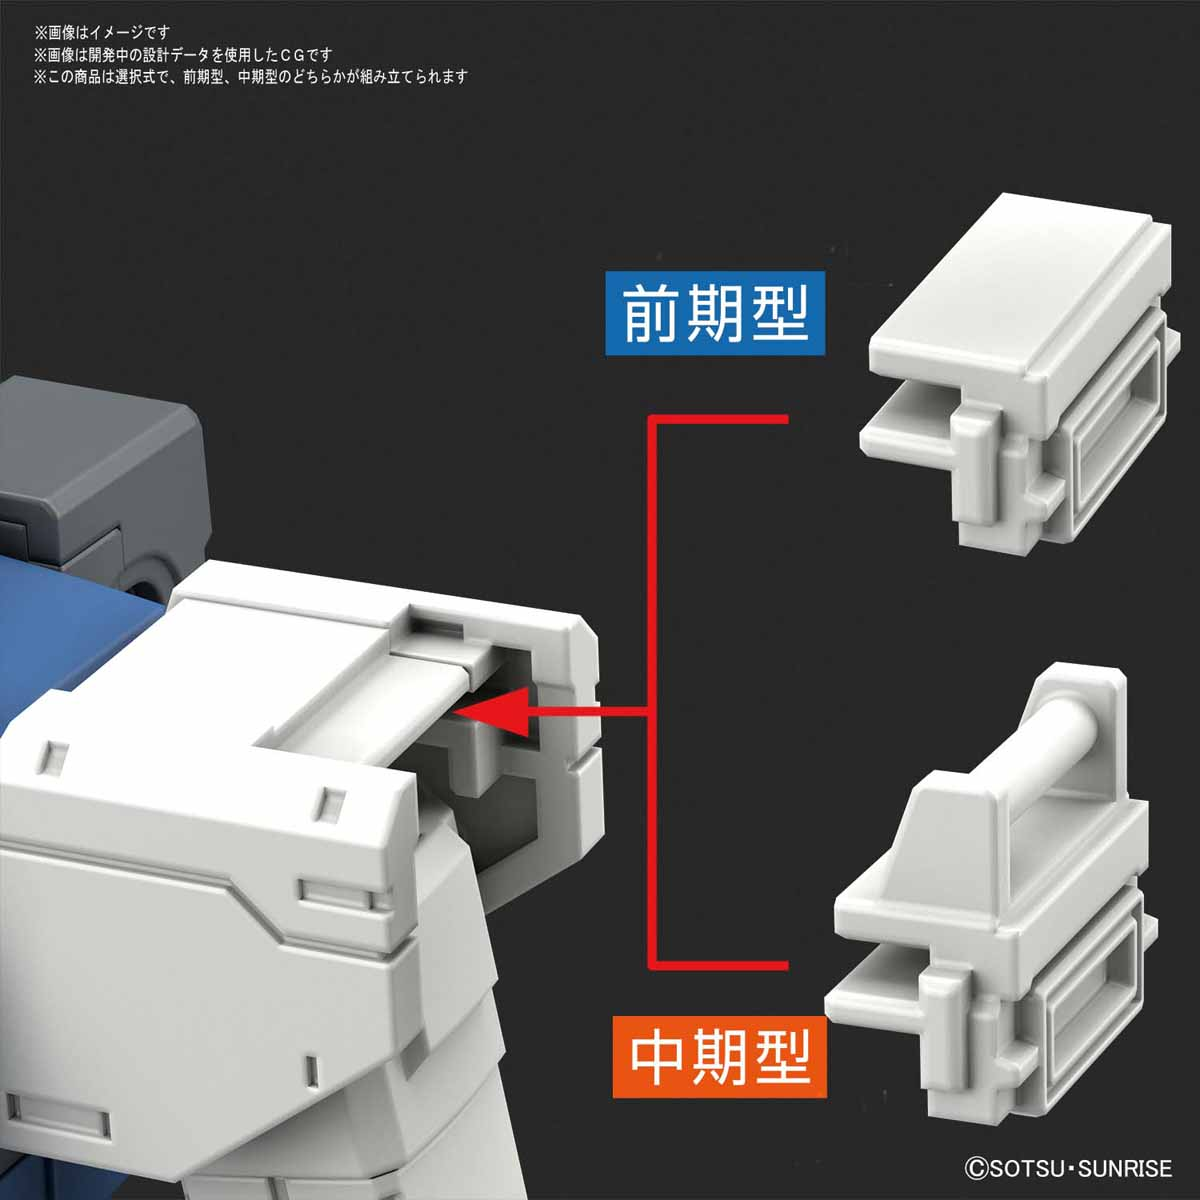 HG 1/144『RX-78-02 ガンダム(GUNDAM THE ORIGIN版)』プラモデル-004